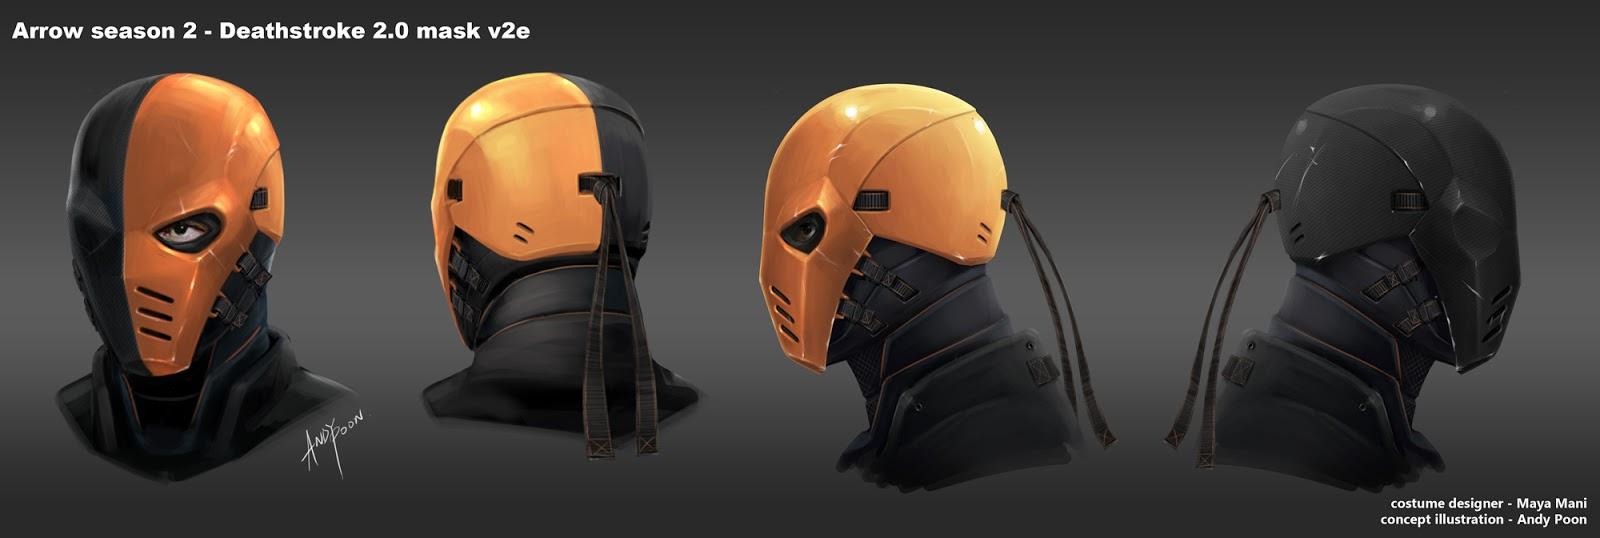 how to make a deathstroke helmet